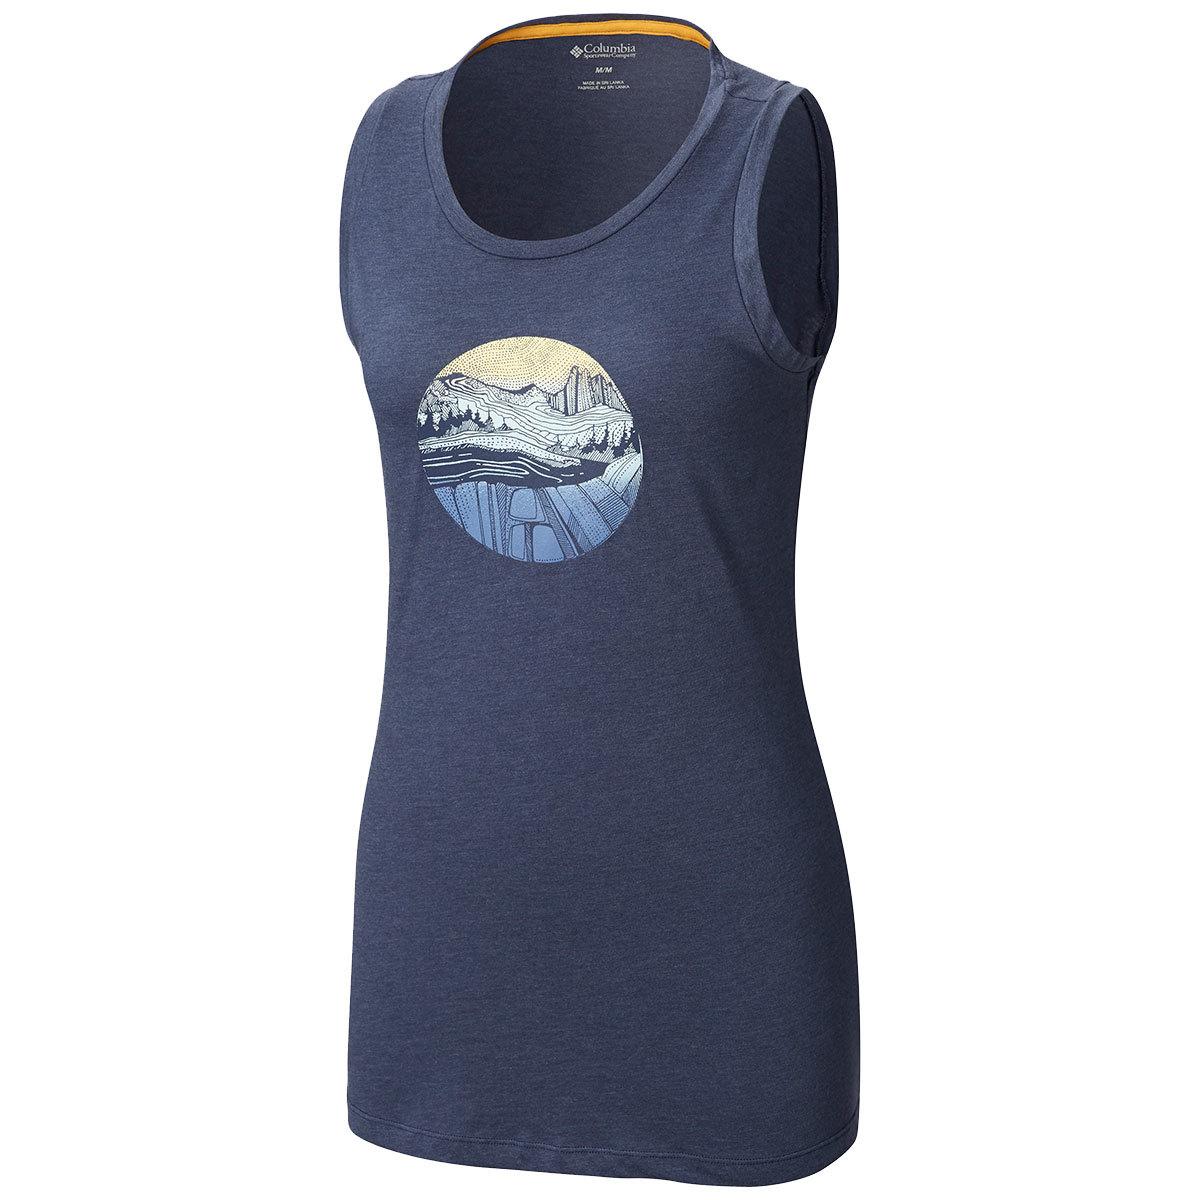 Columbia Women's Sandy Trail Graphic Tank Top - Blue, M